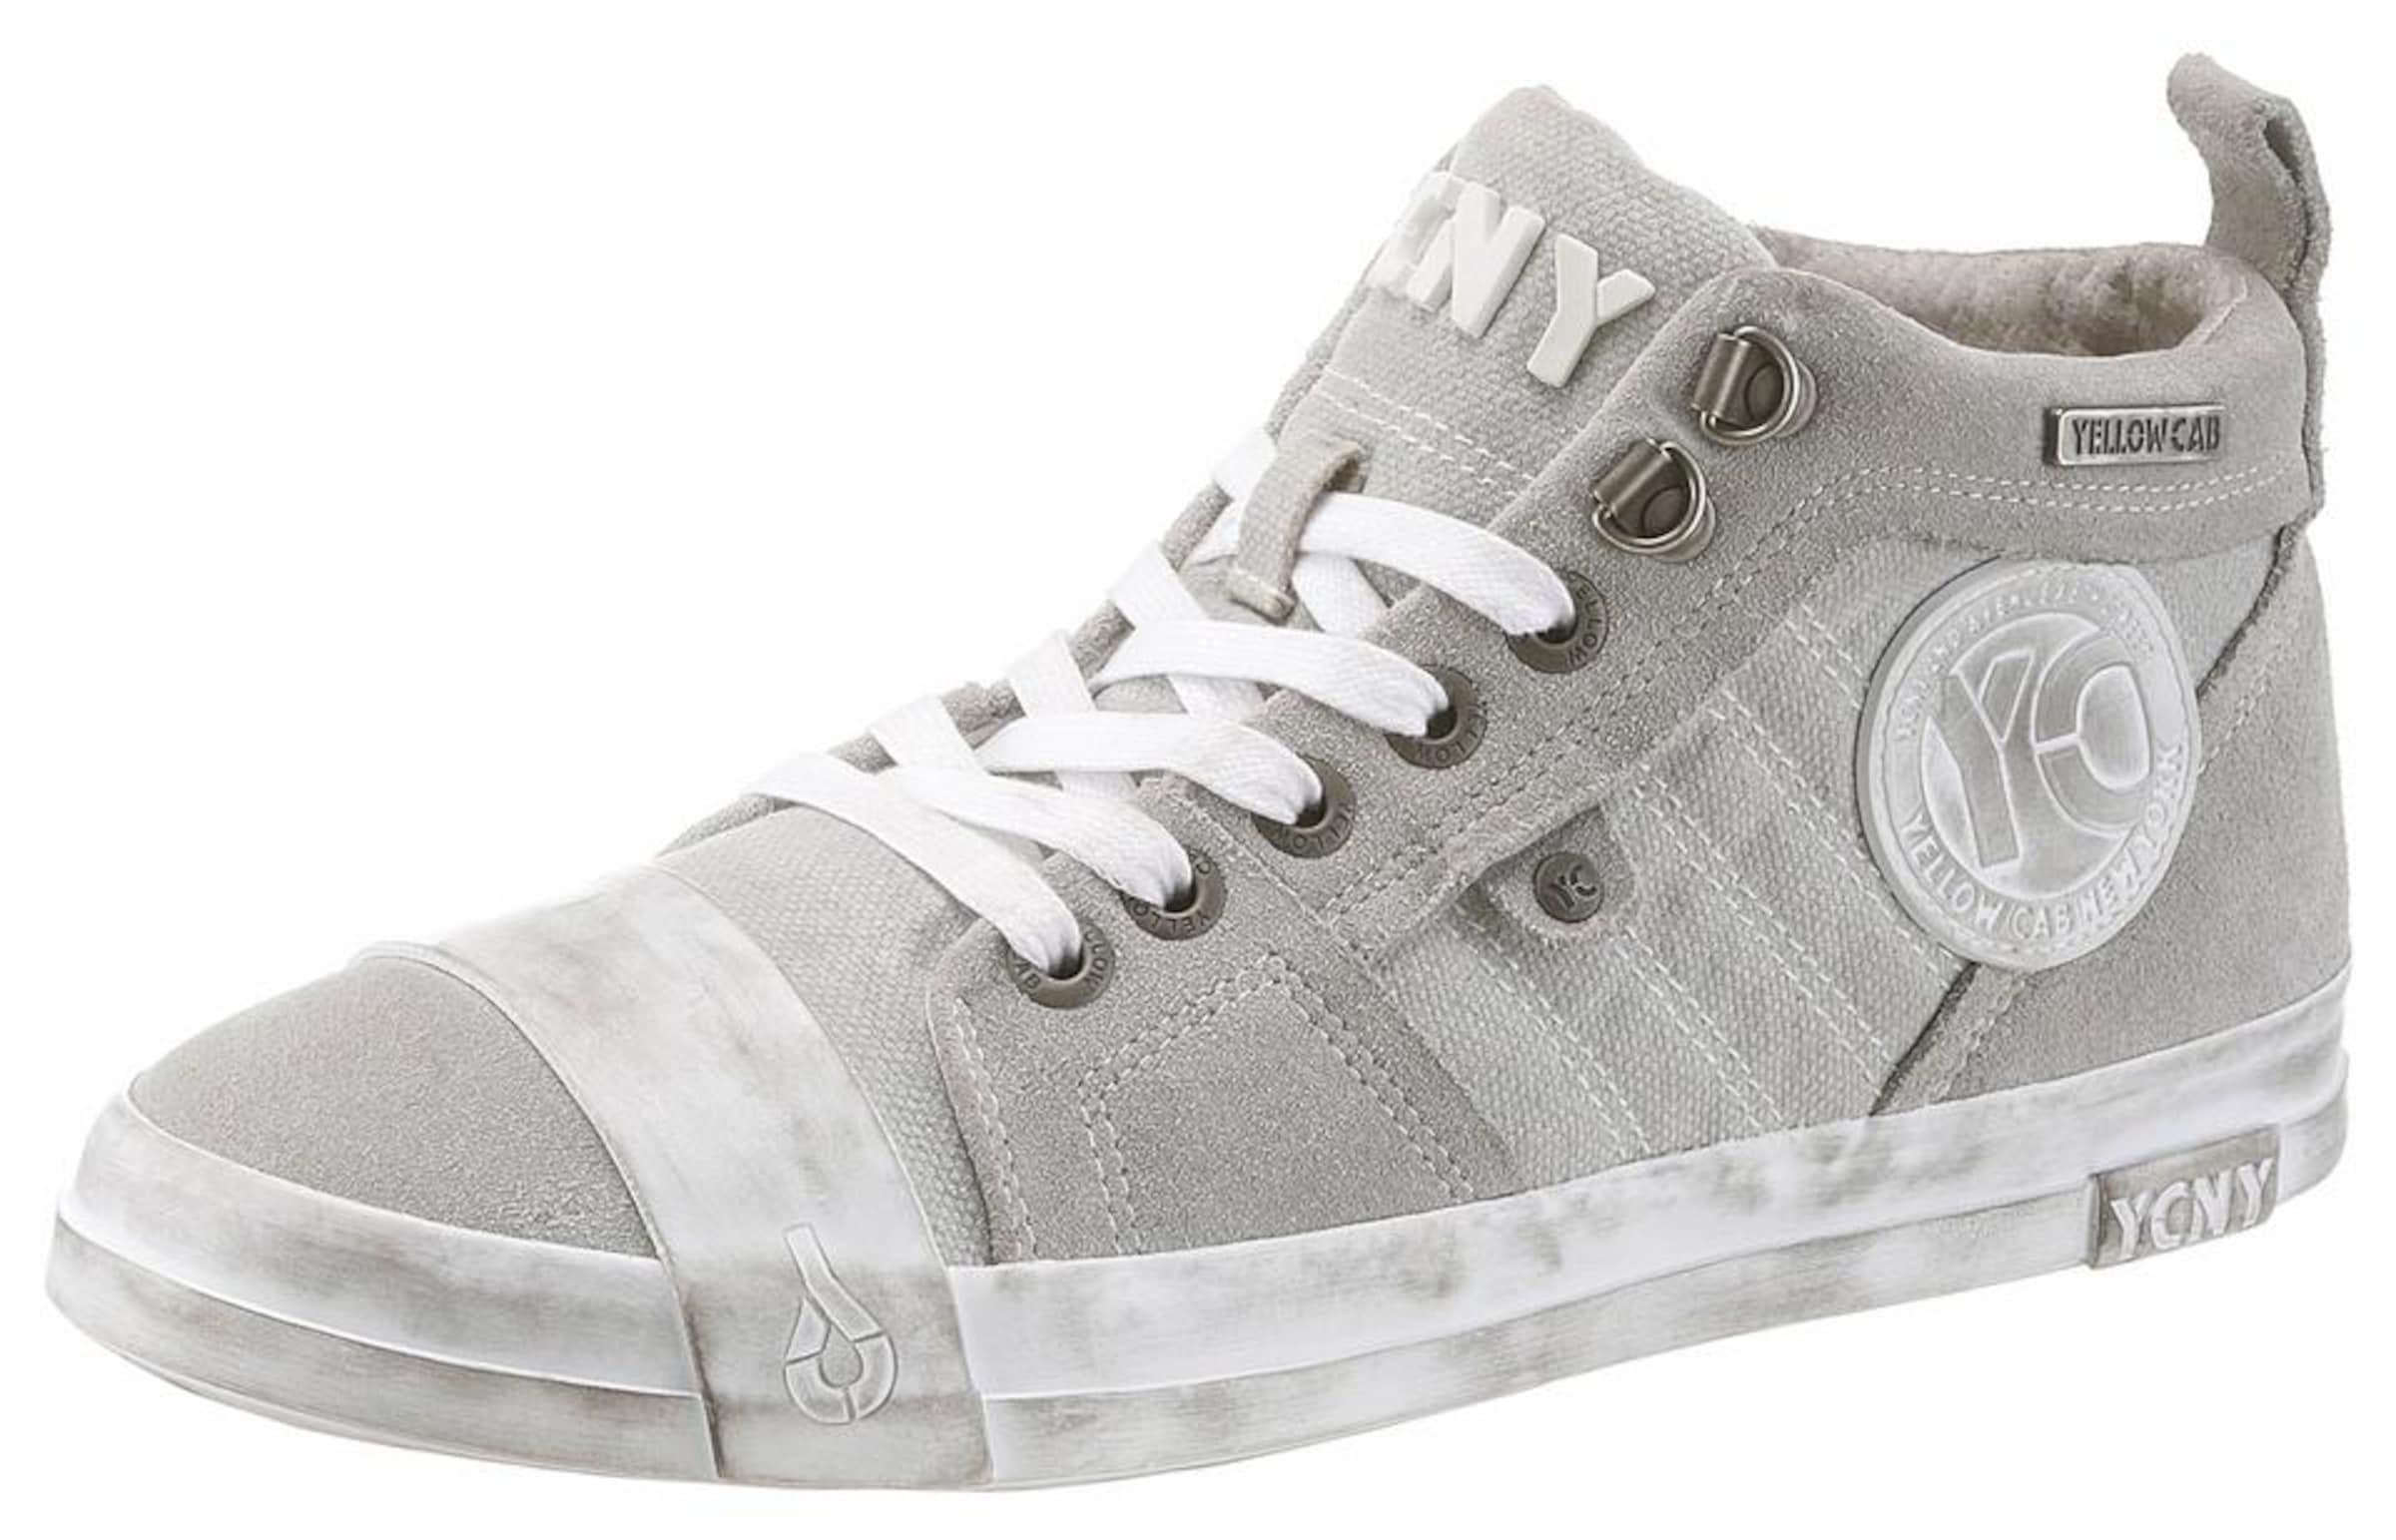 Haltbare Mode billige Schuhe YELLOW CAB | Sneaker Schuhe Schuhe Schuhe Gut getragene Schuhe 55e71f